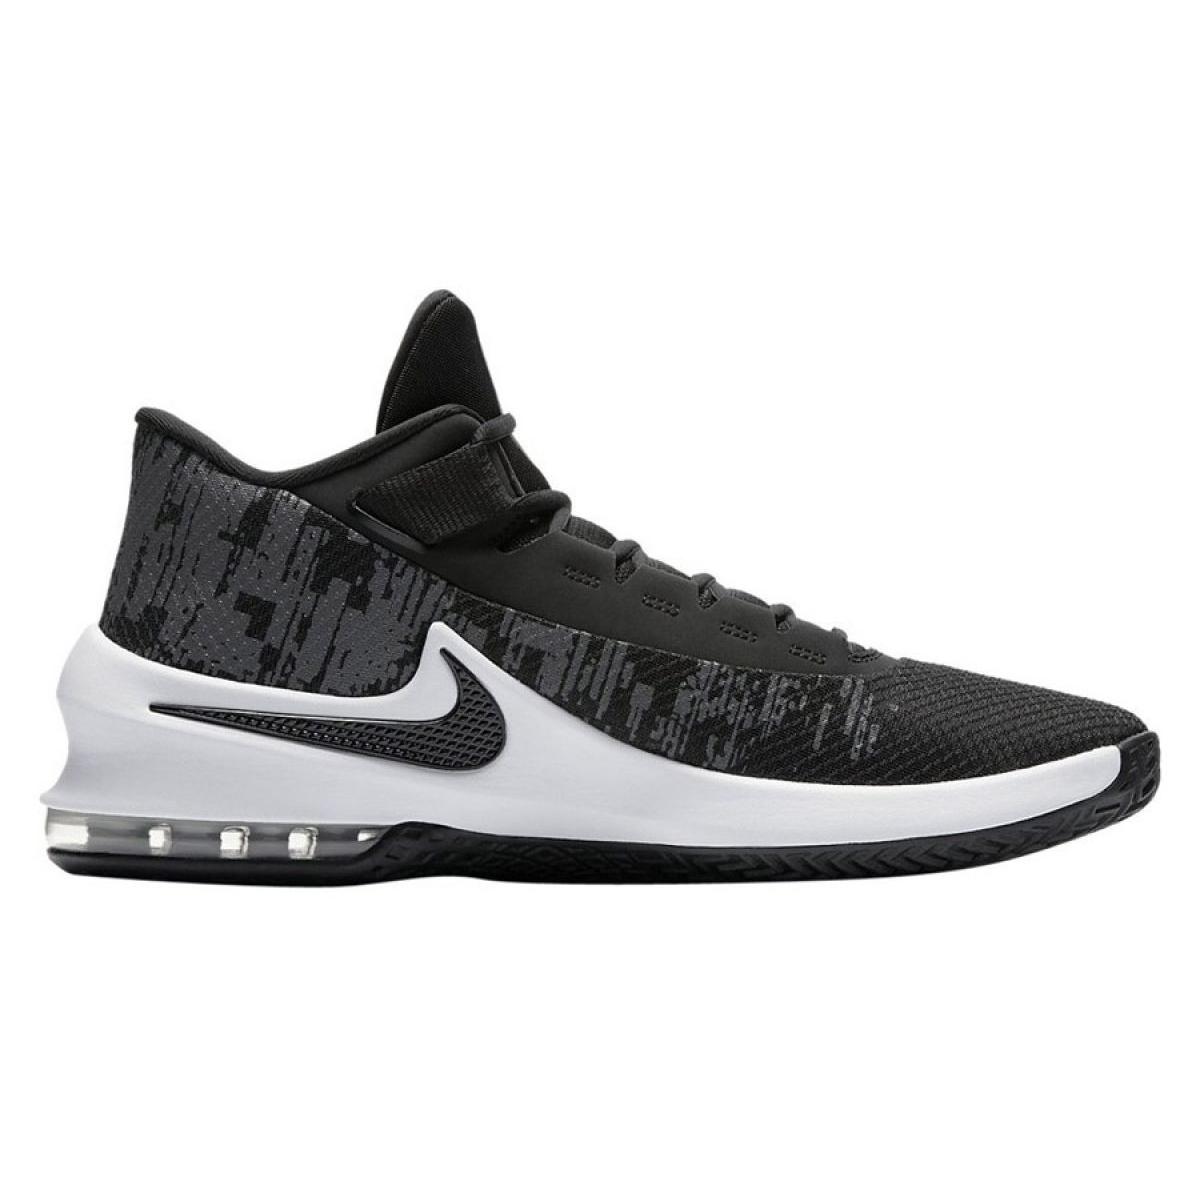 Detalles de Zapatillas de baloncesto Nike Air Max Infuriate 2 Mid M AA7066 001 negro negro